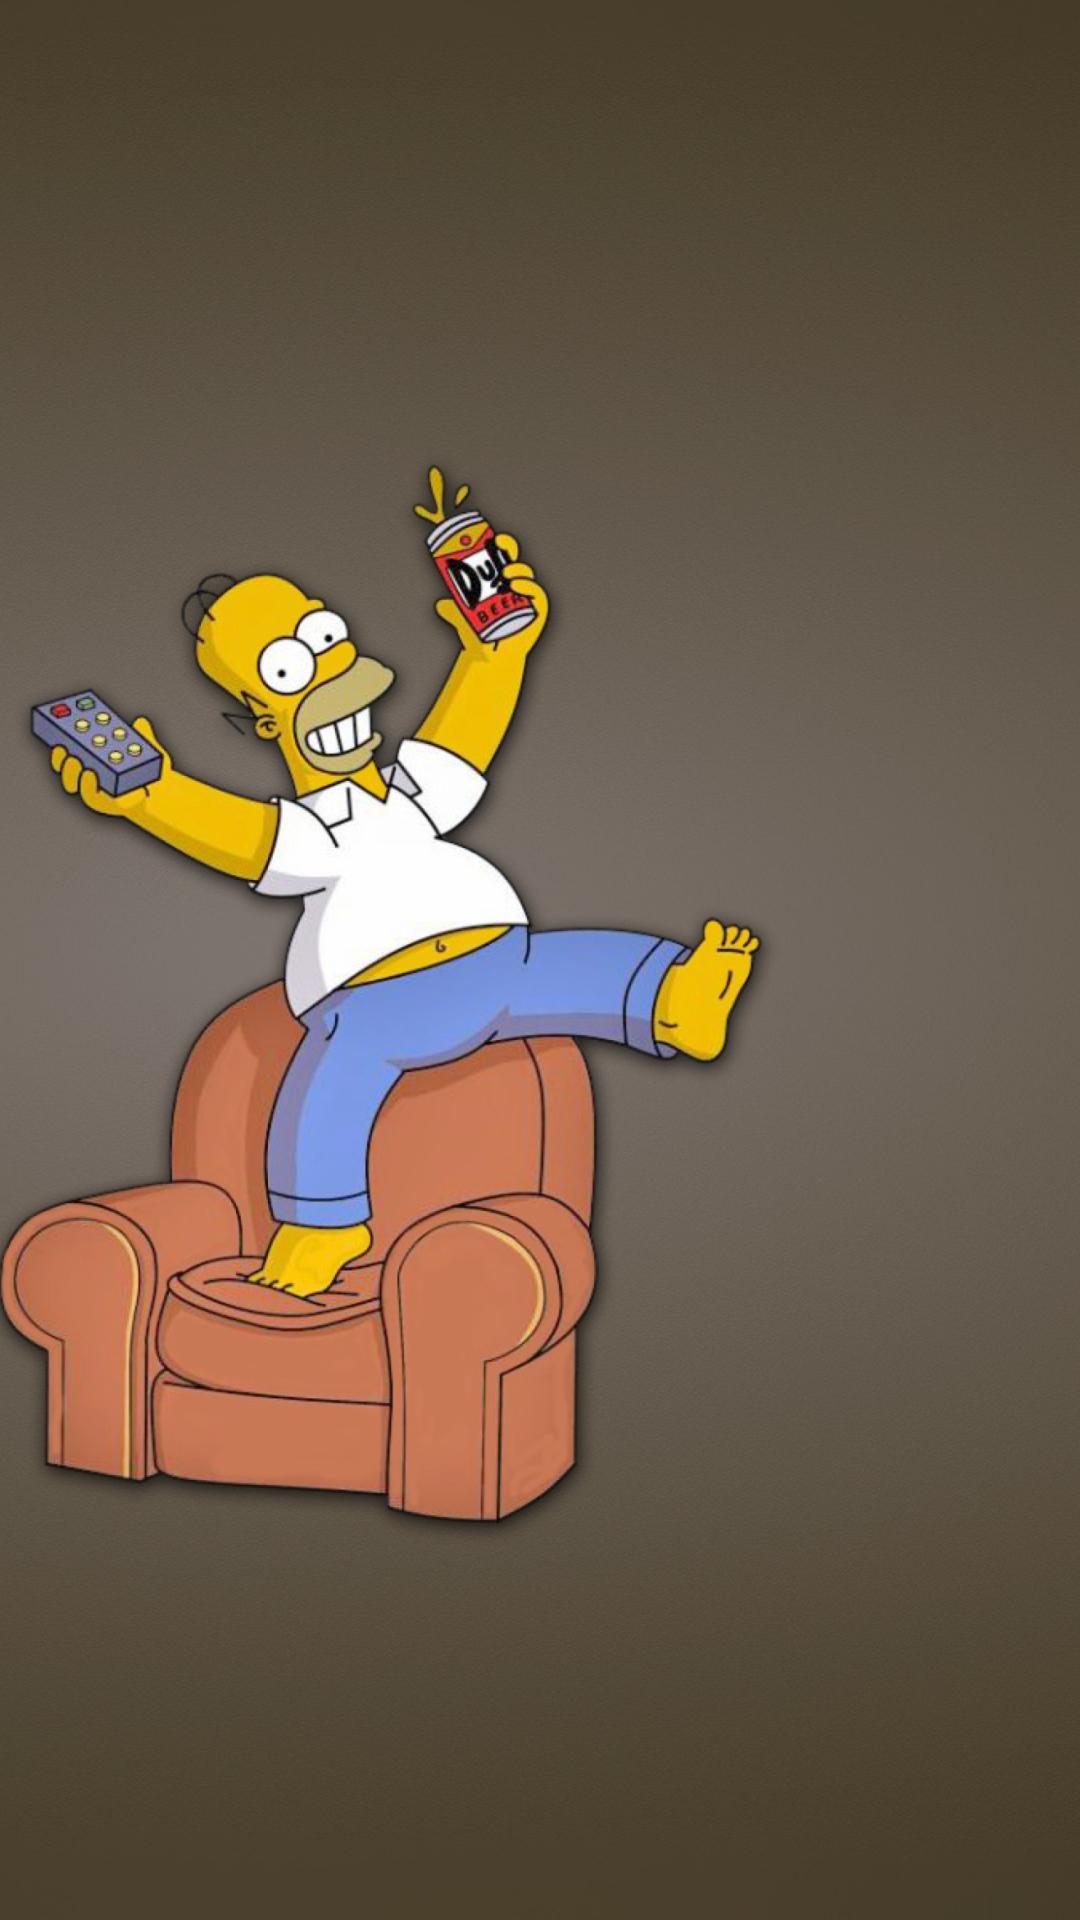 Гомер симпсон картинки на телефон, мая открытка